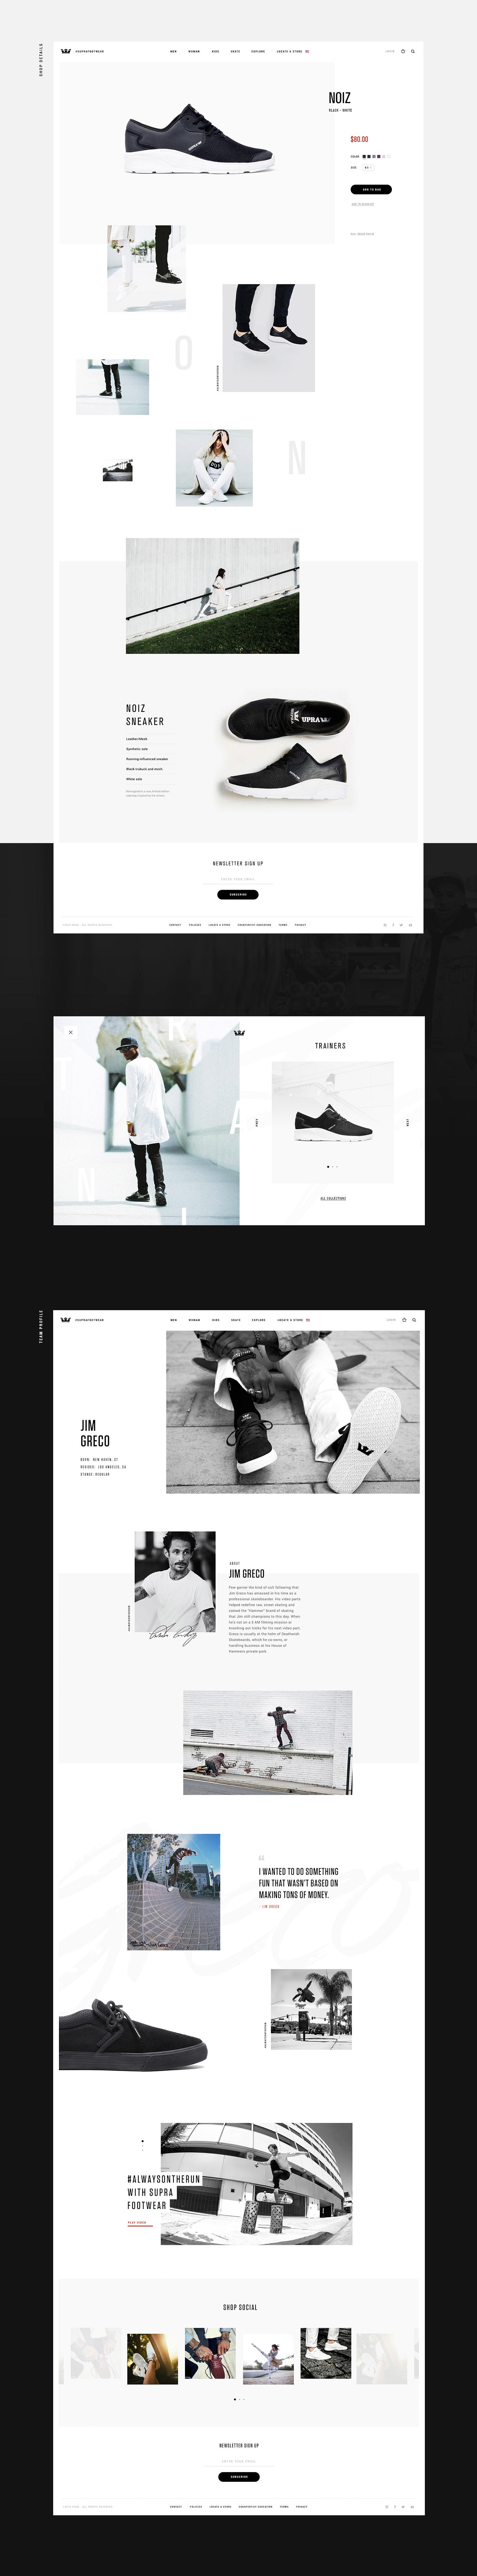 Supra interaction Ecommerce grid UI ux redesign animation  streetwear footwear